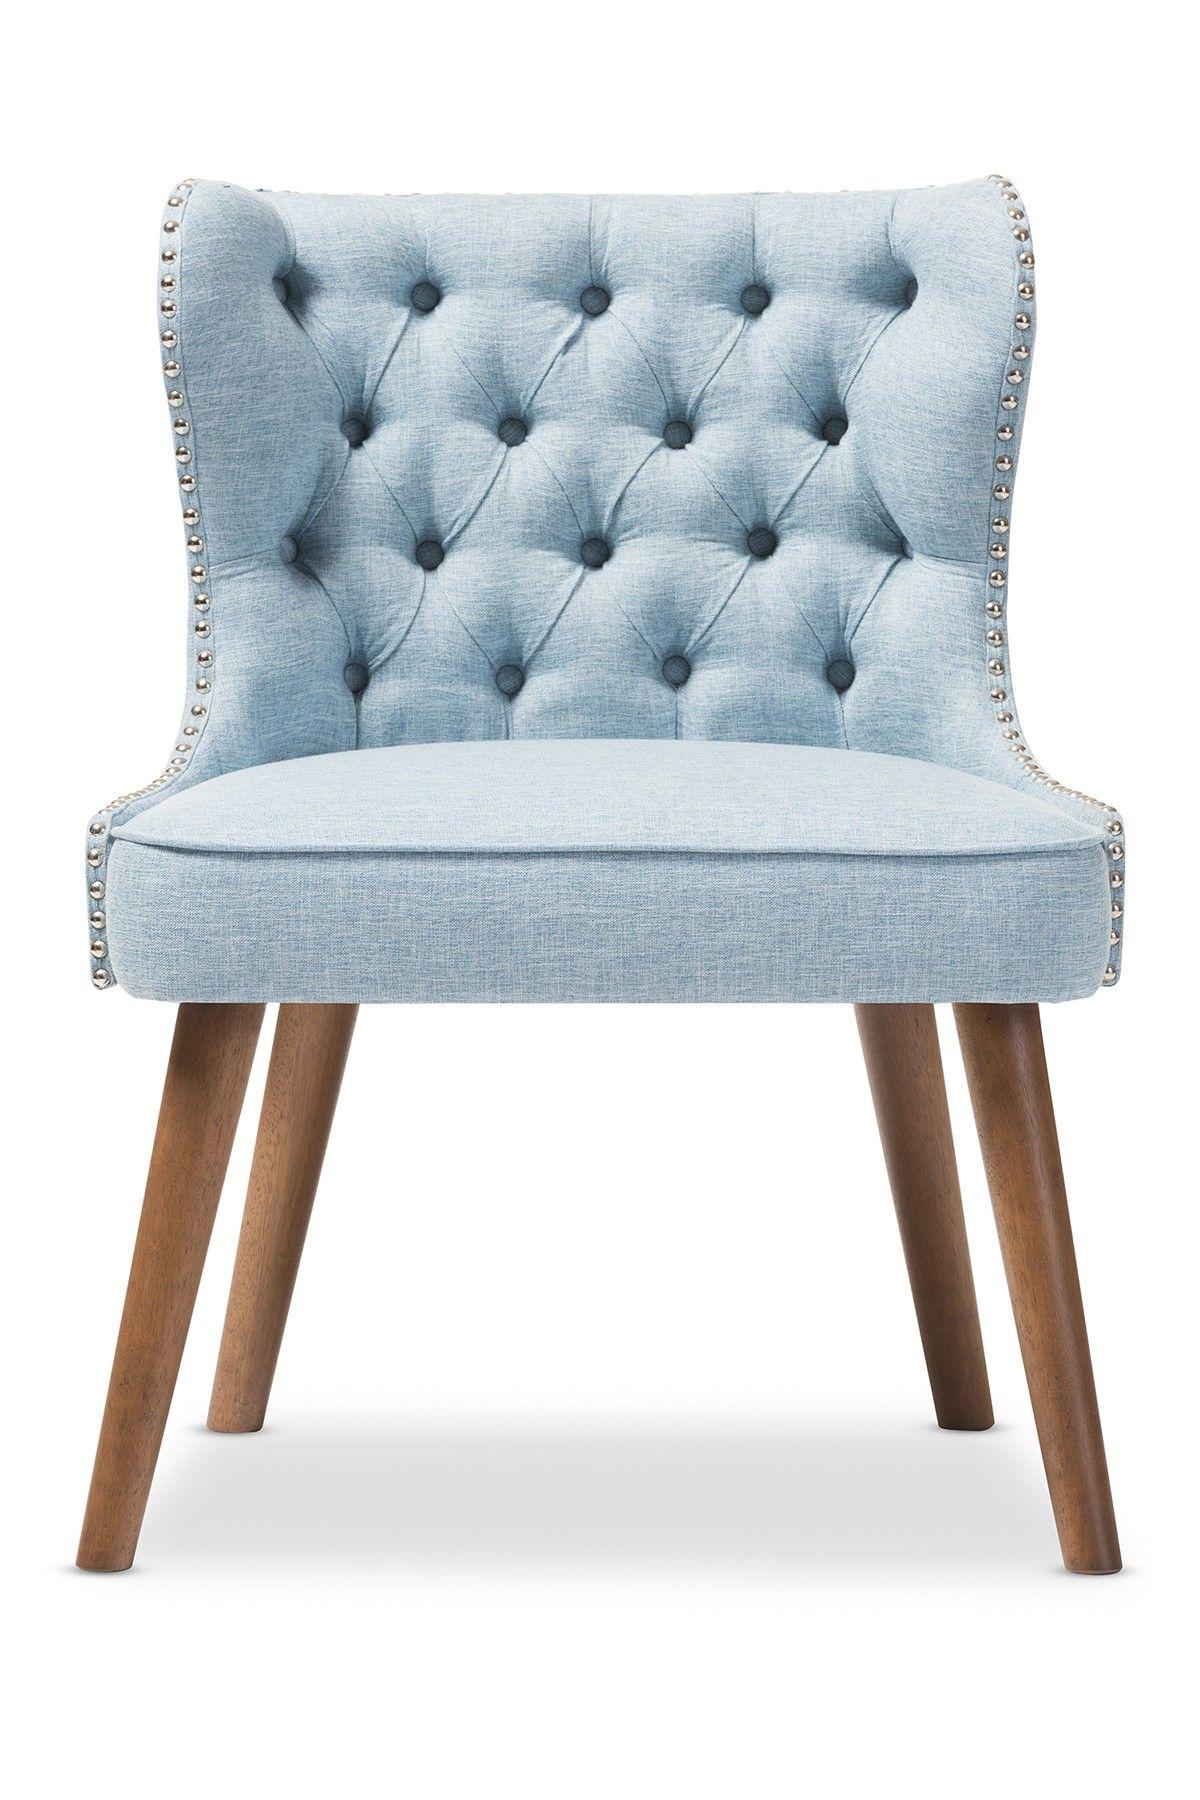 Loveseat Wingback Stud Chair